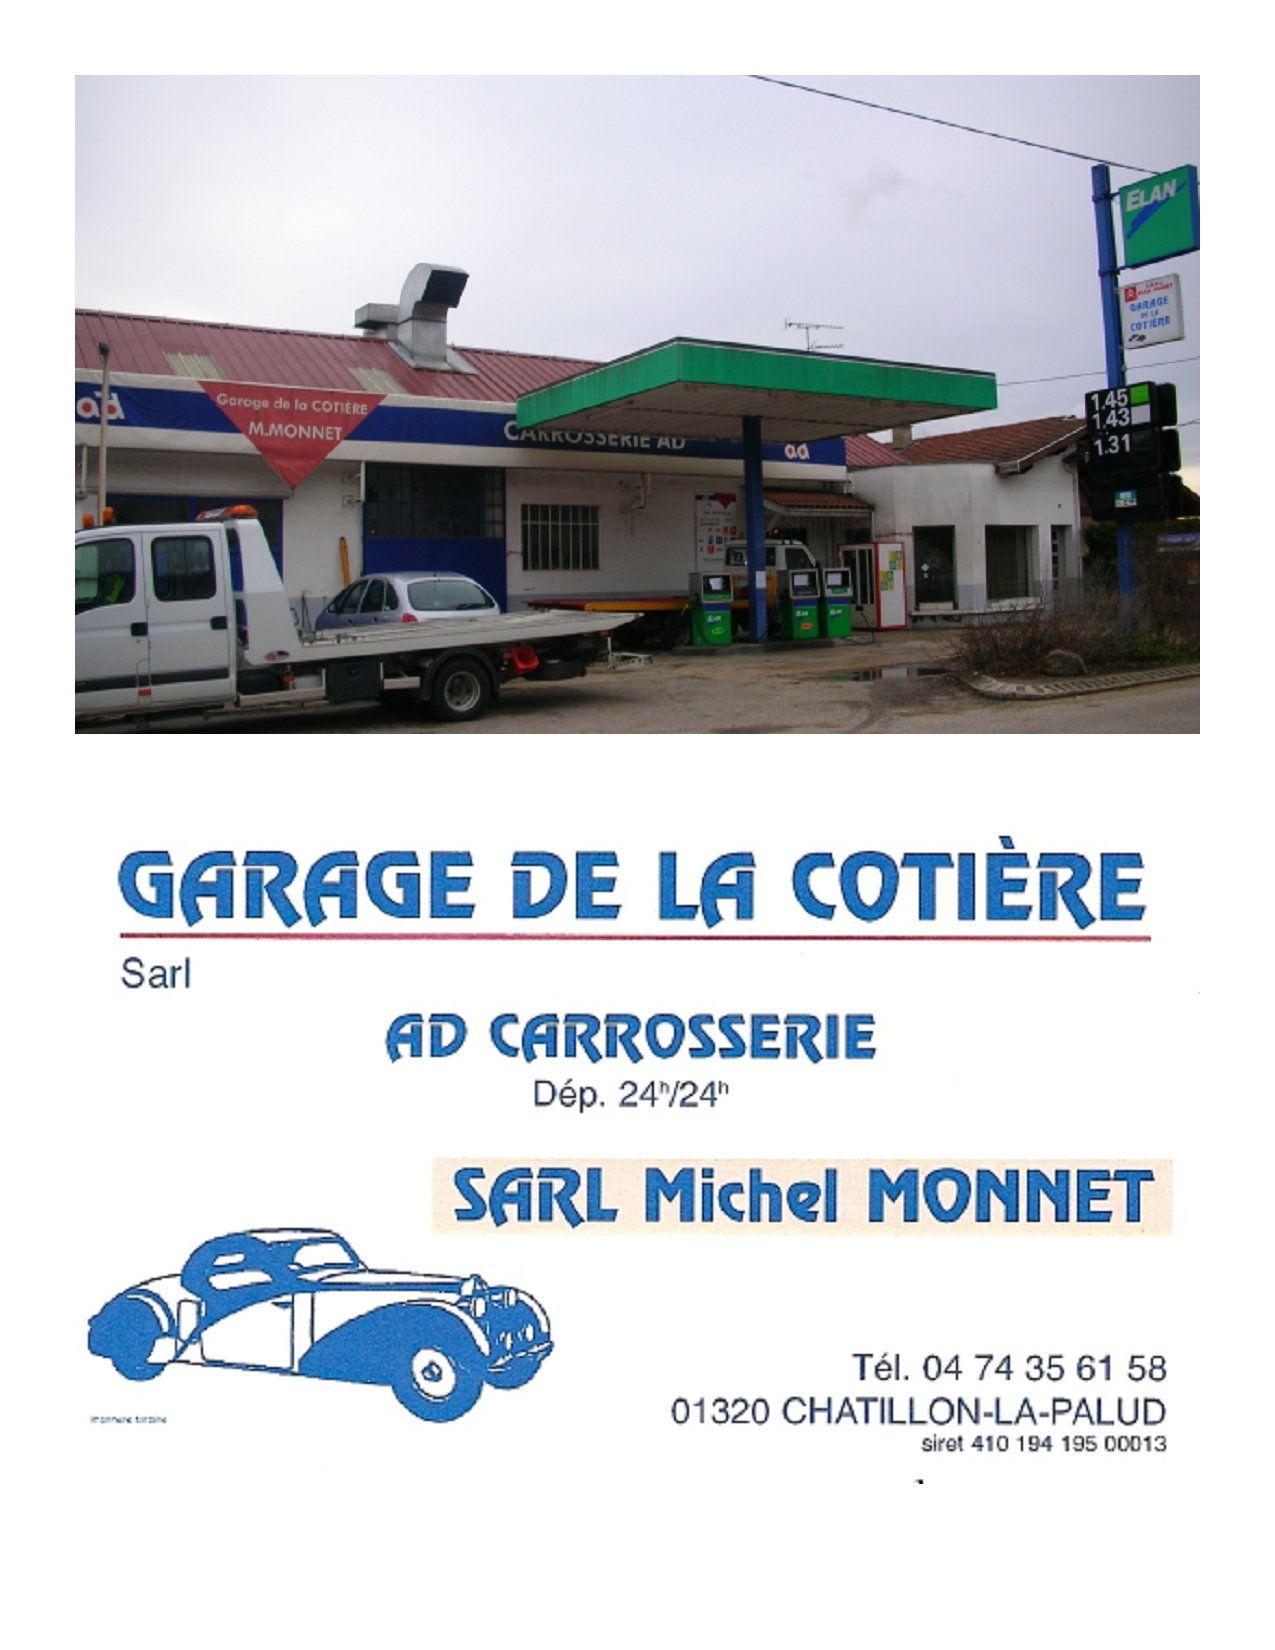 Garage de la cotiere for Horaire garage ad